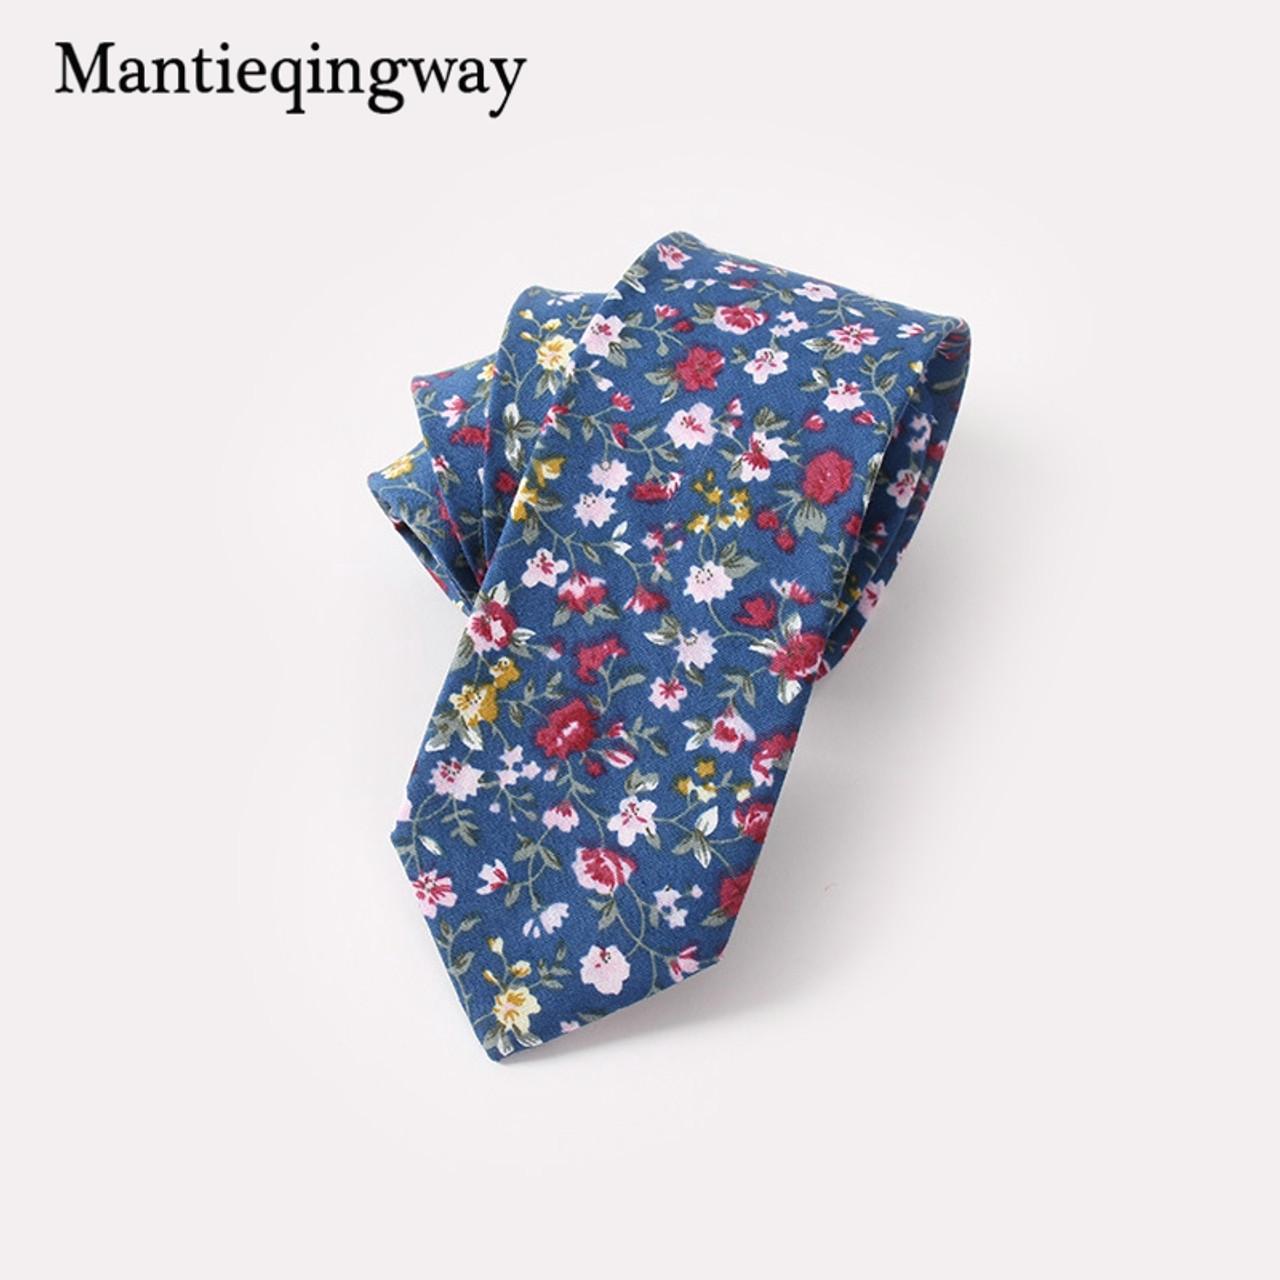 New Man Cotton Blue Floral Dot Neck Tie Wedding Party Necktie Narrow Slim Skinny